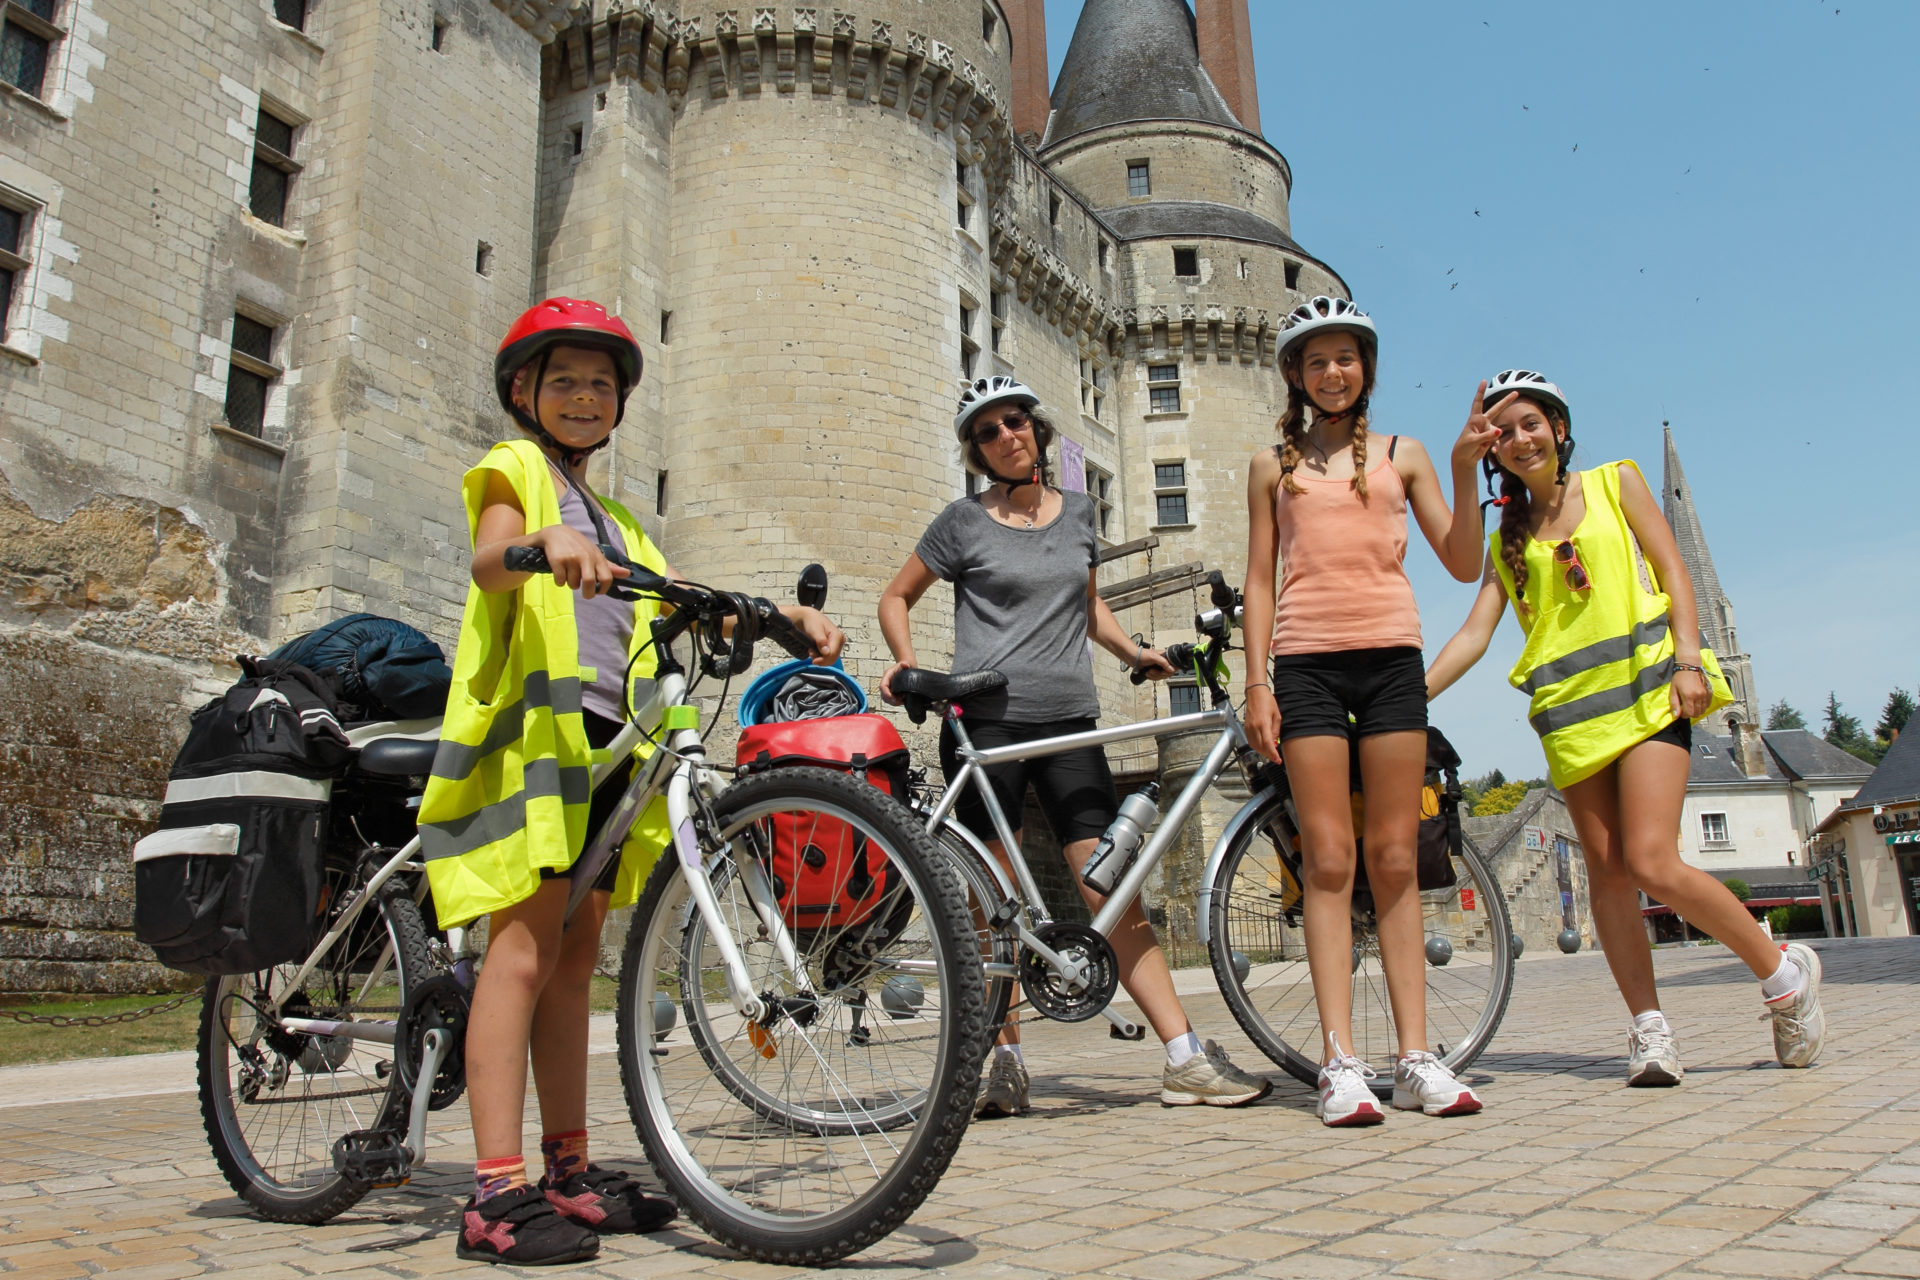 Chateaux de la Loire en velo